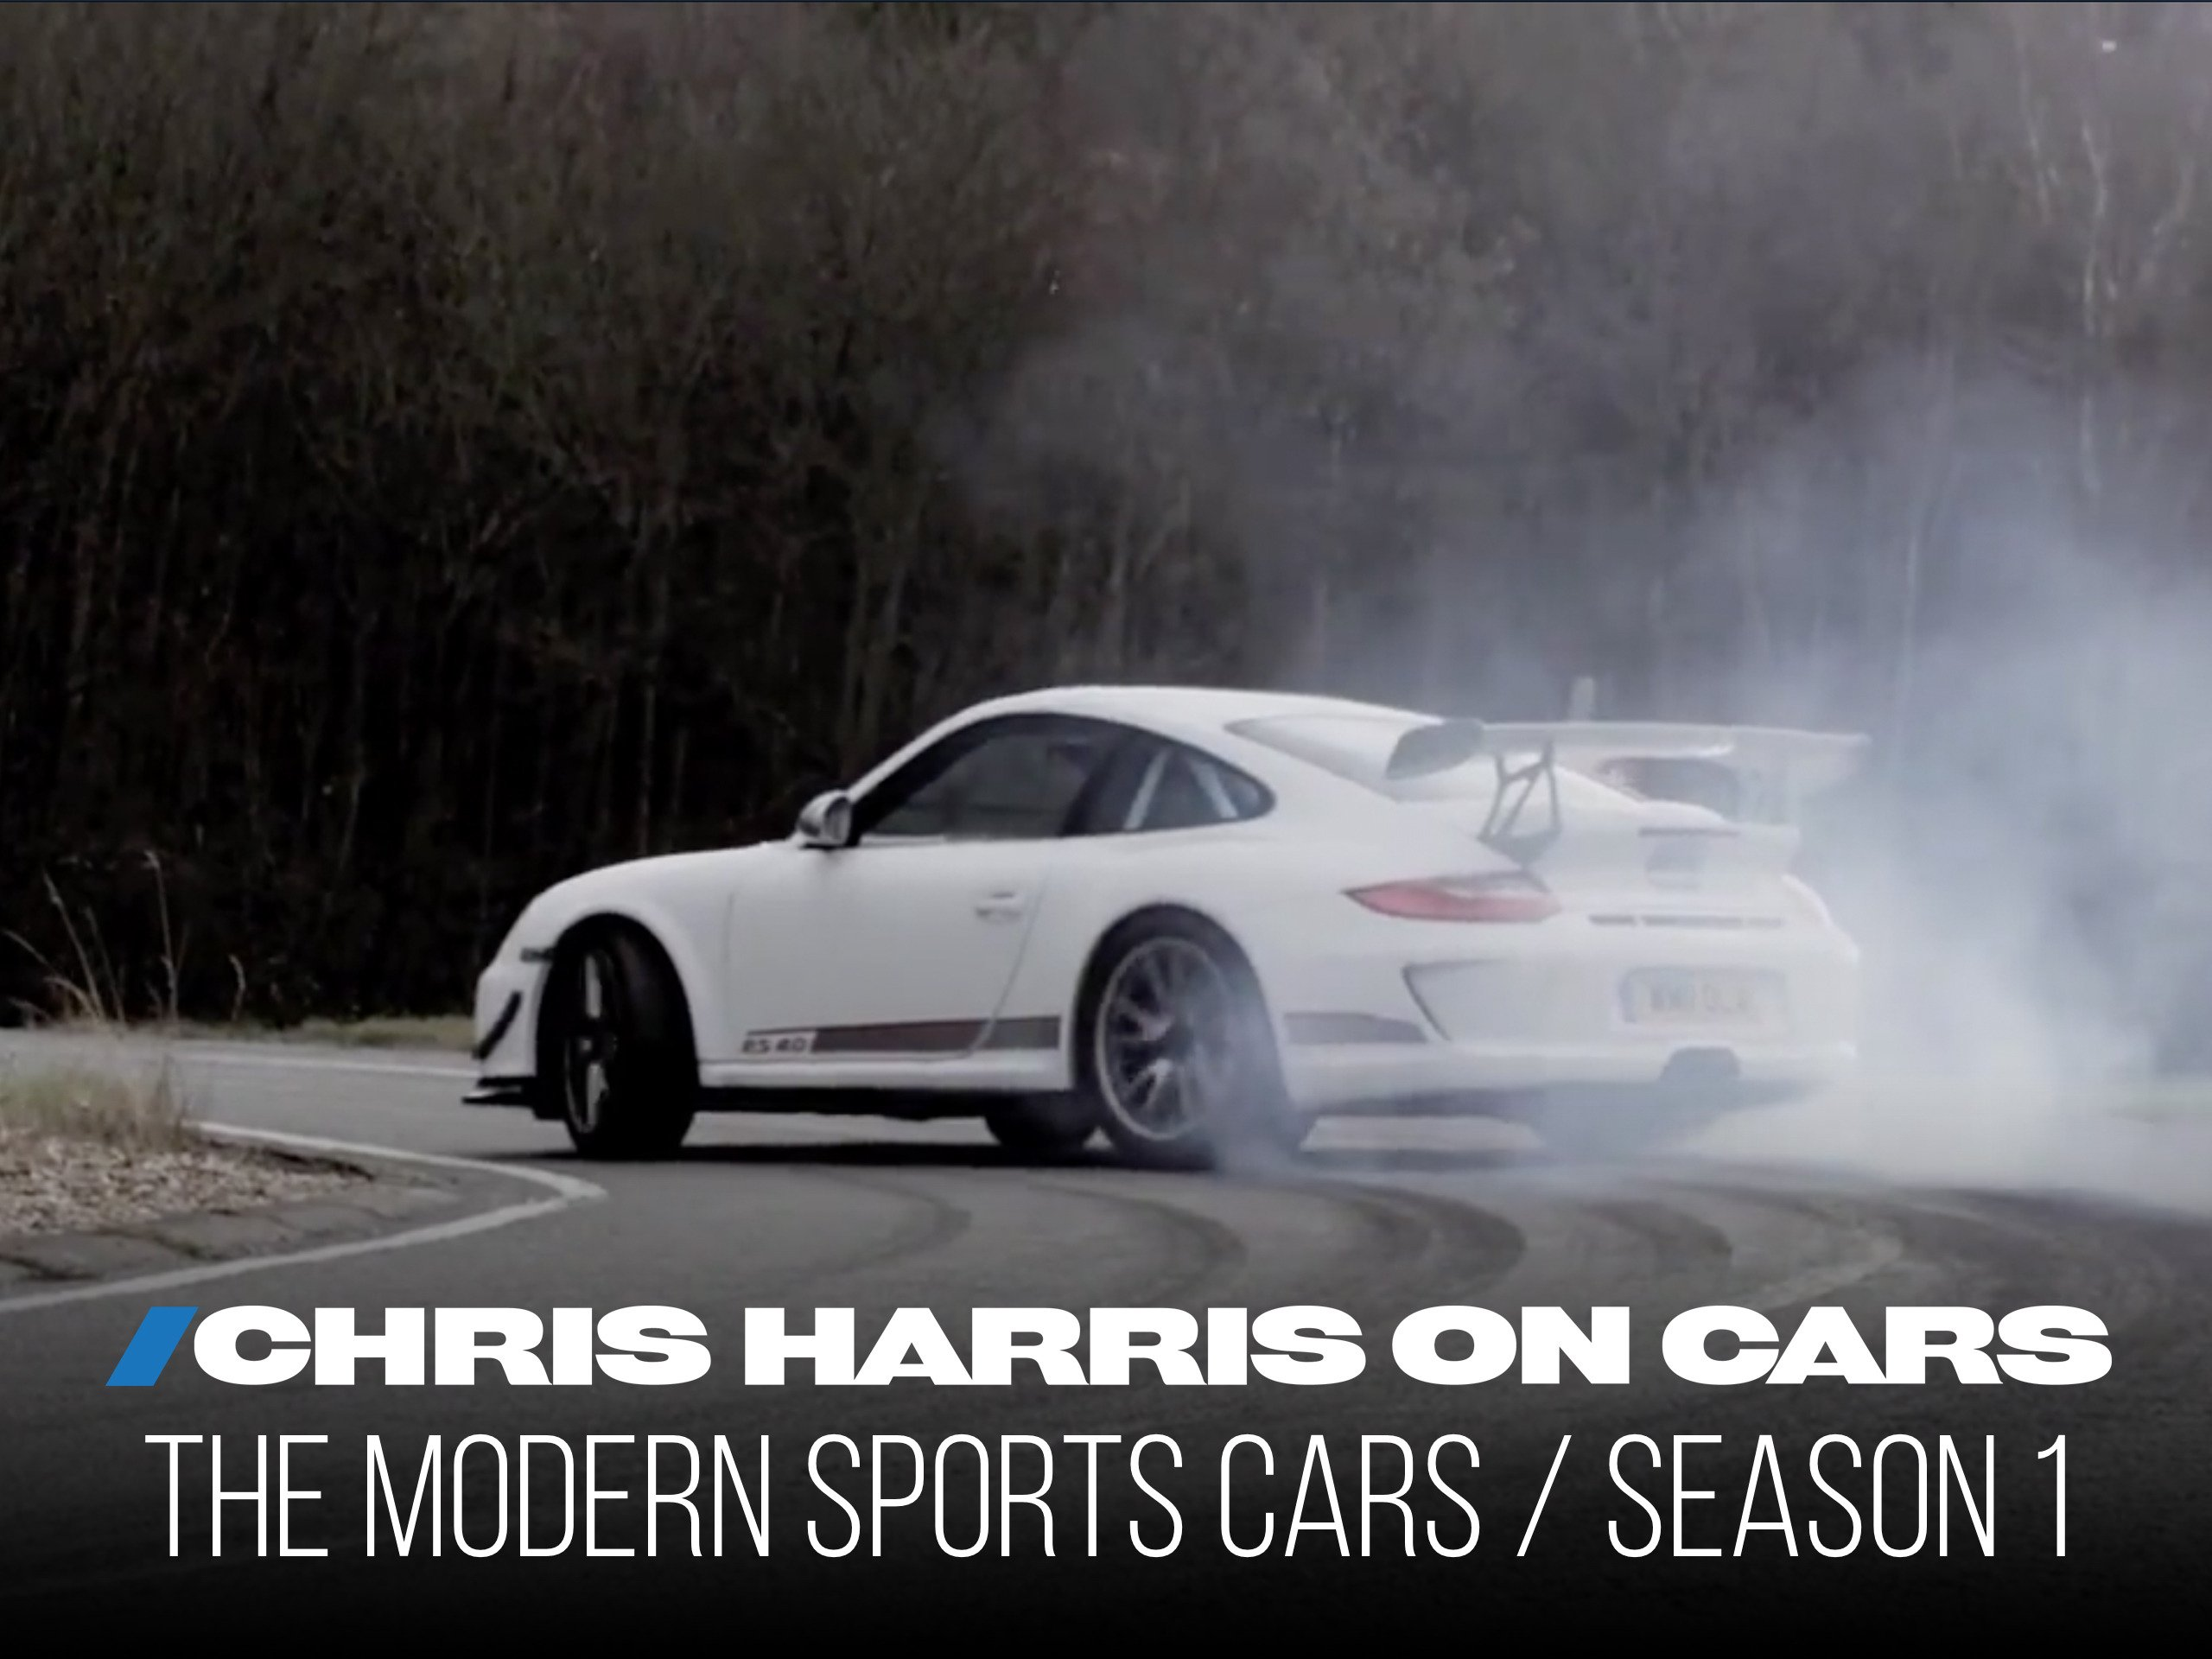 Amazon.com: /CHRIS HARRIS ON CARS The Modern Sports Cars Season 1: Chris Harris, Neil Carey